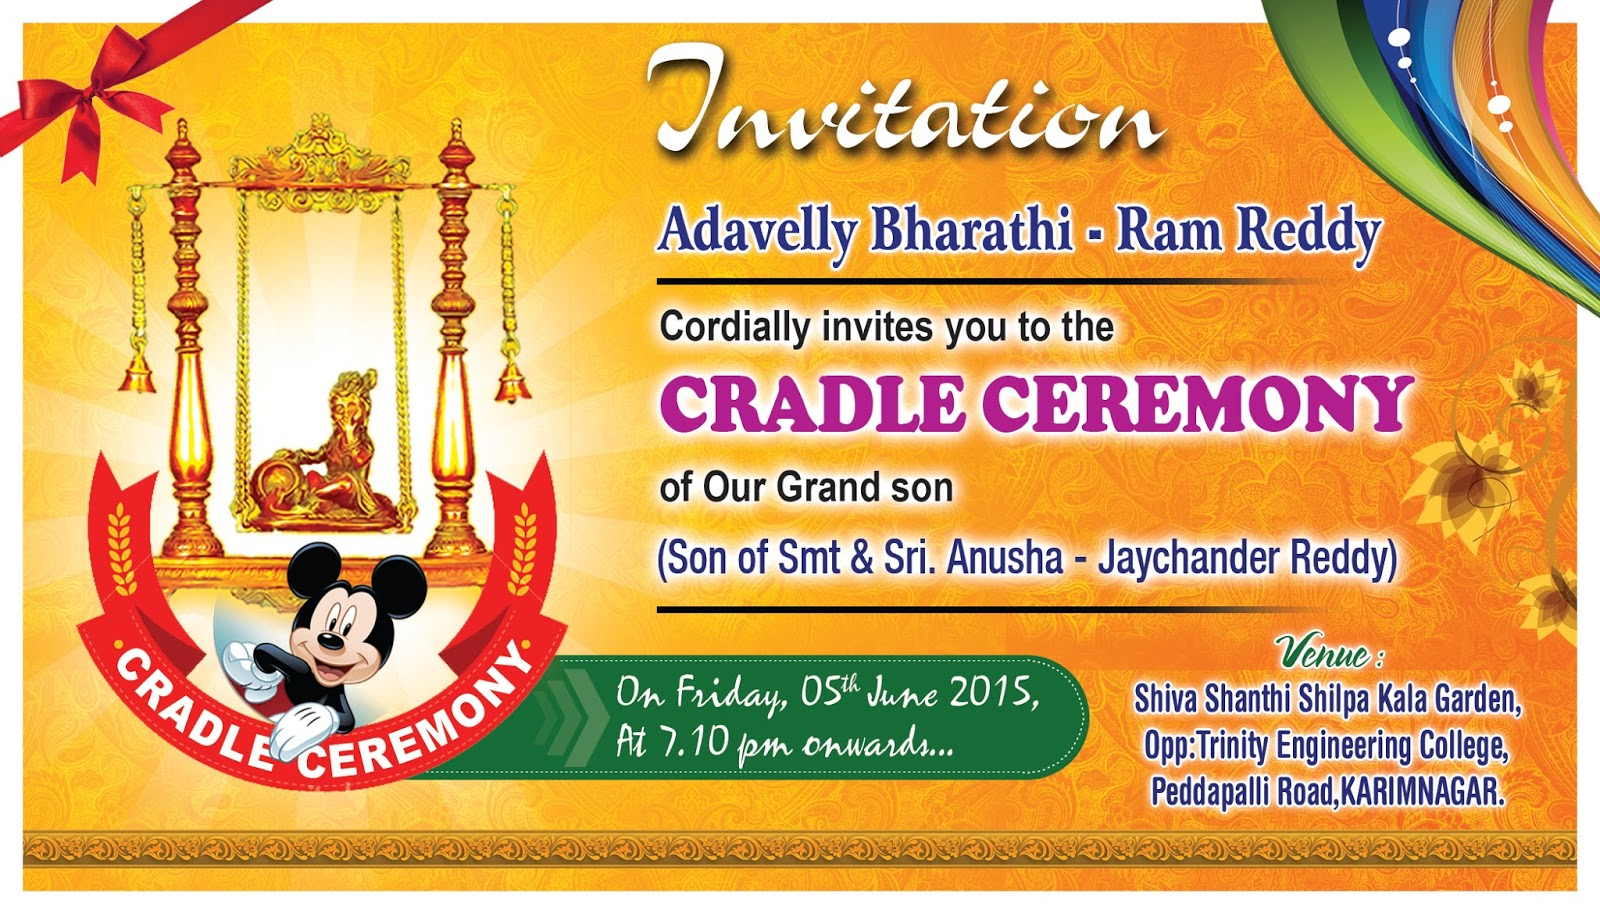 Cradle ceremony invitation card psd template free downloads hindu naming ceremony invitation wording psd template free downloads stopboris Gallery